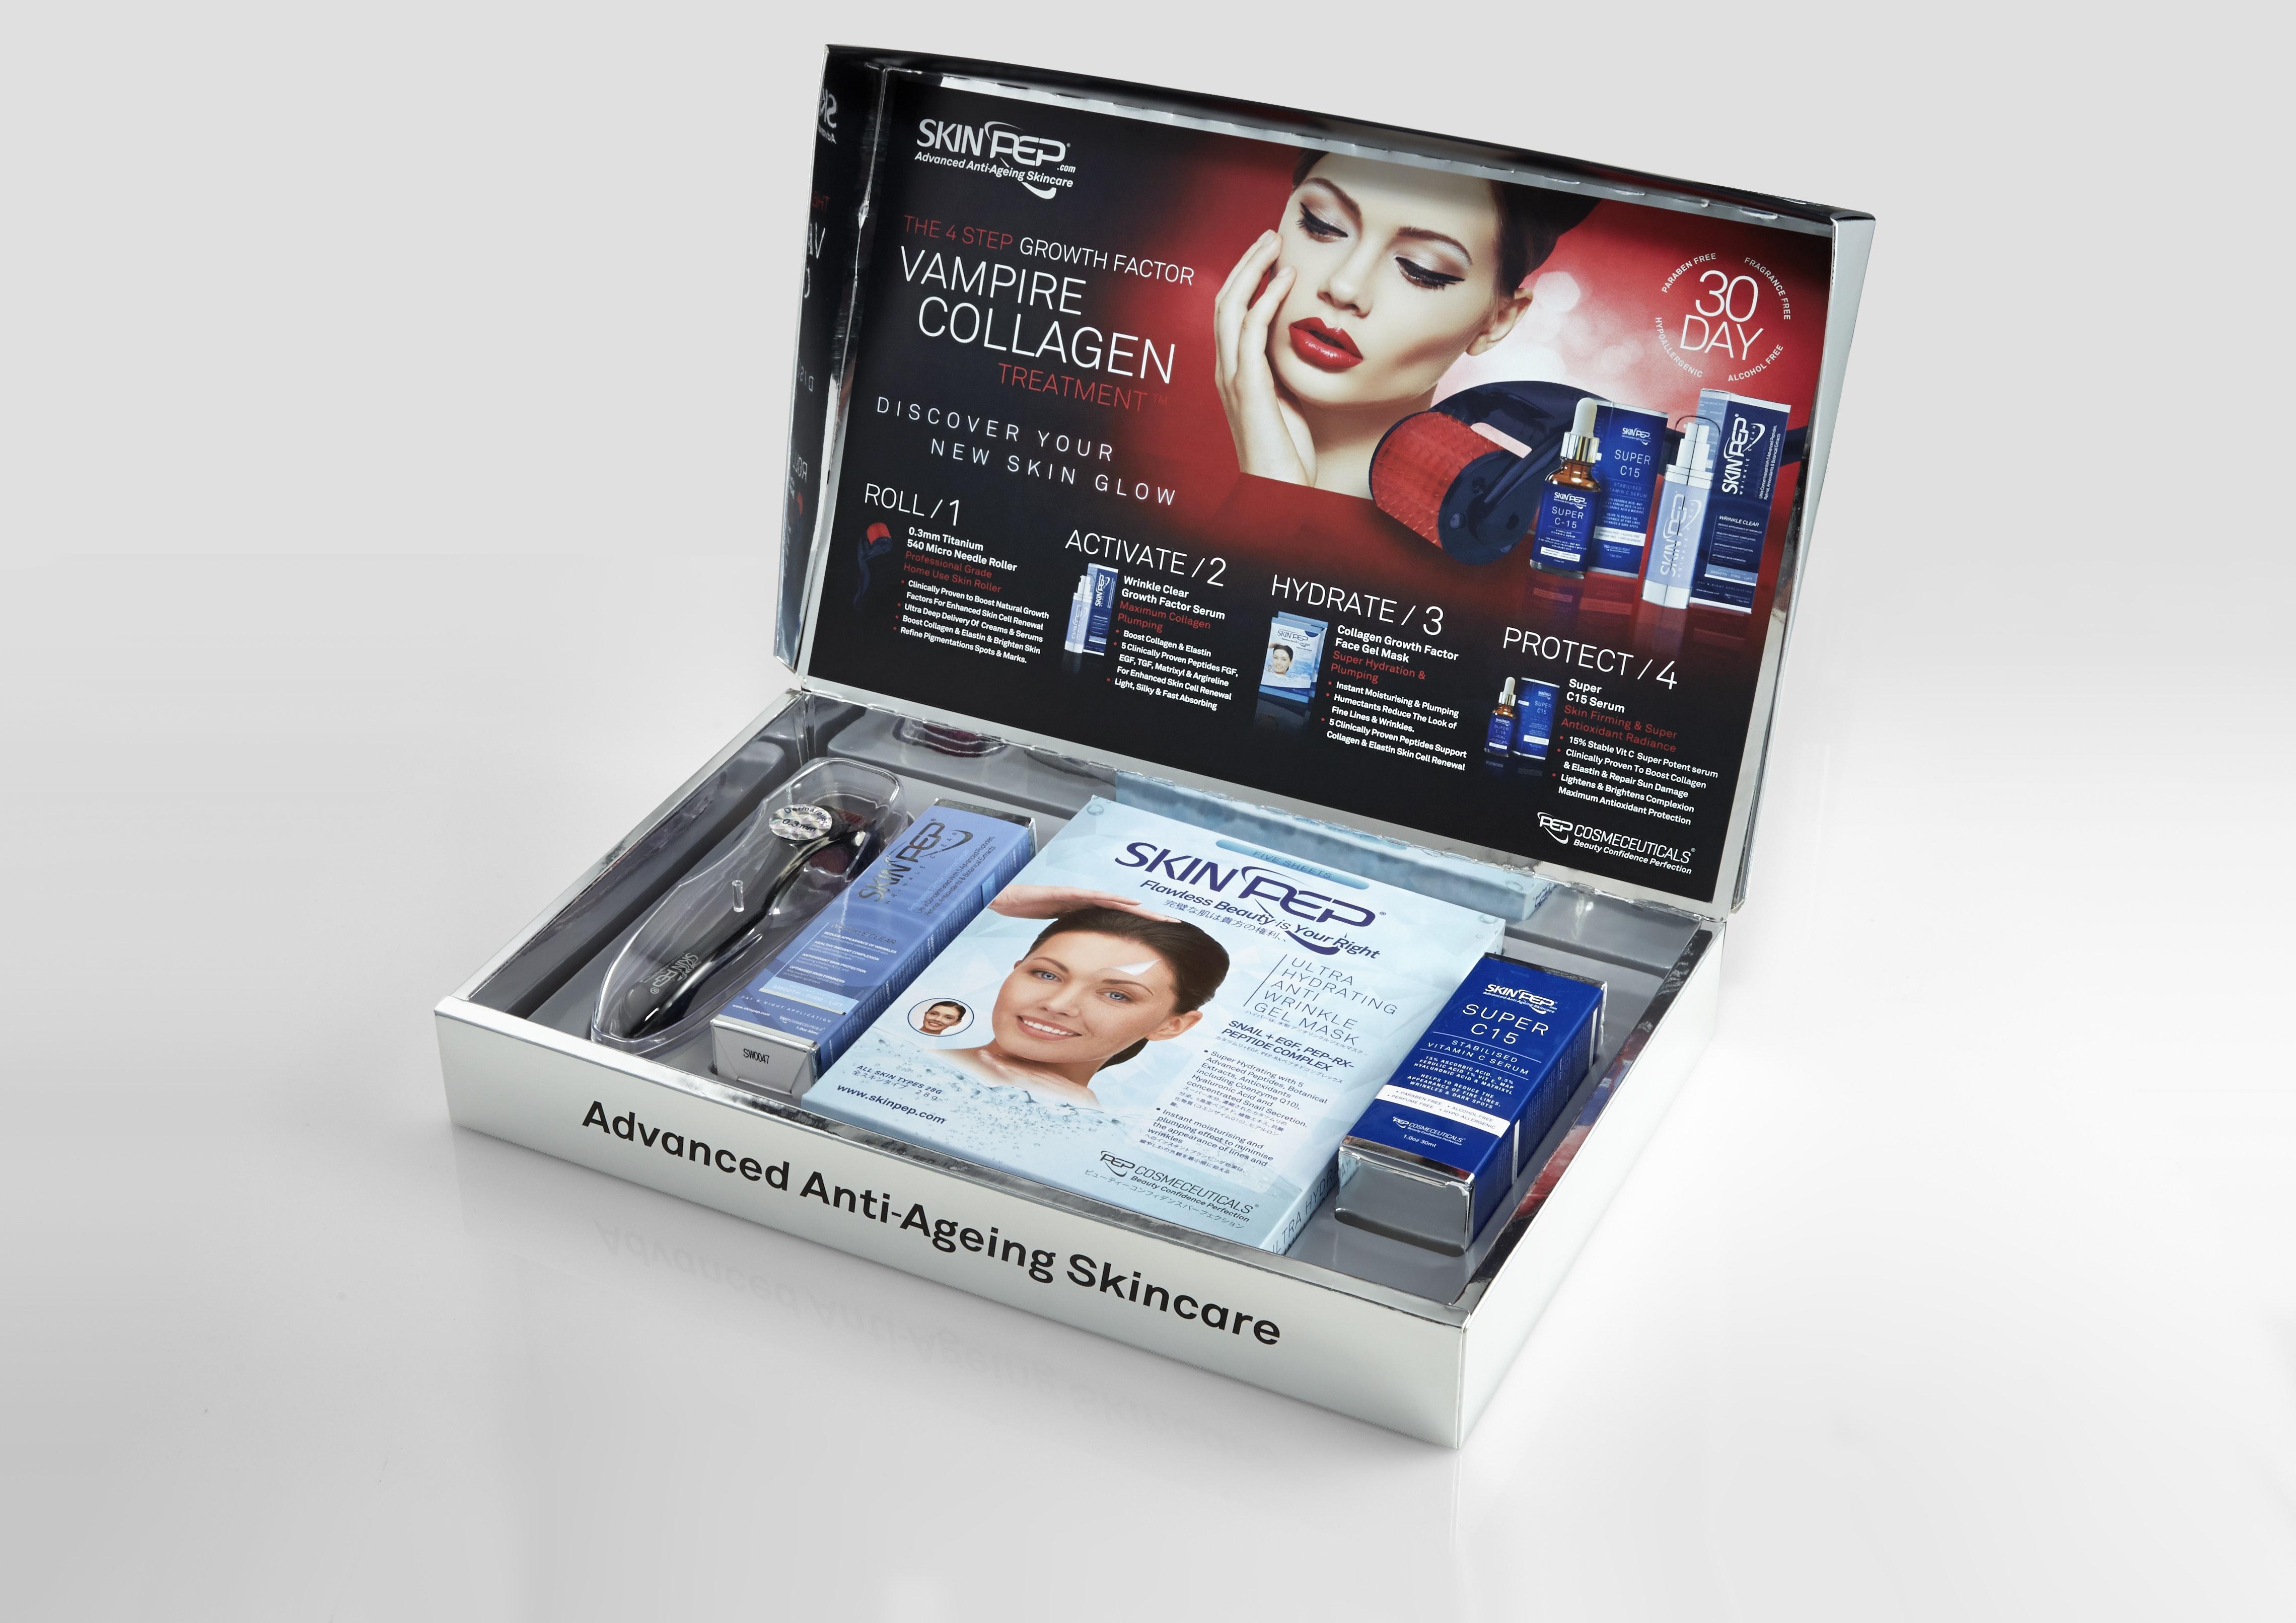 Vampire collagen box set open